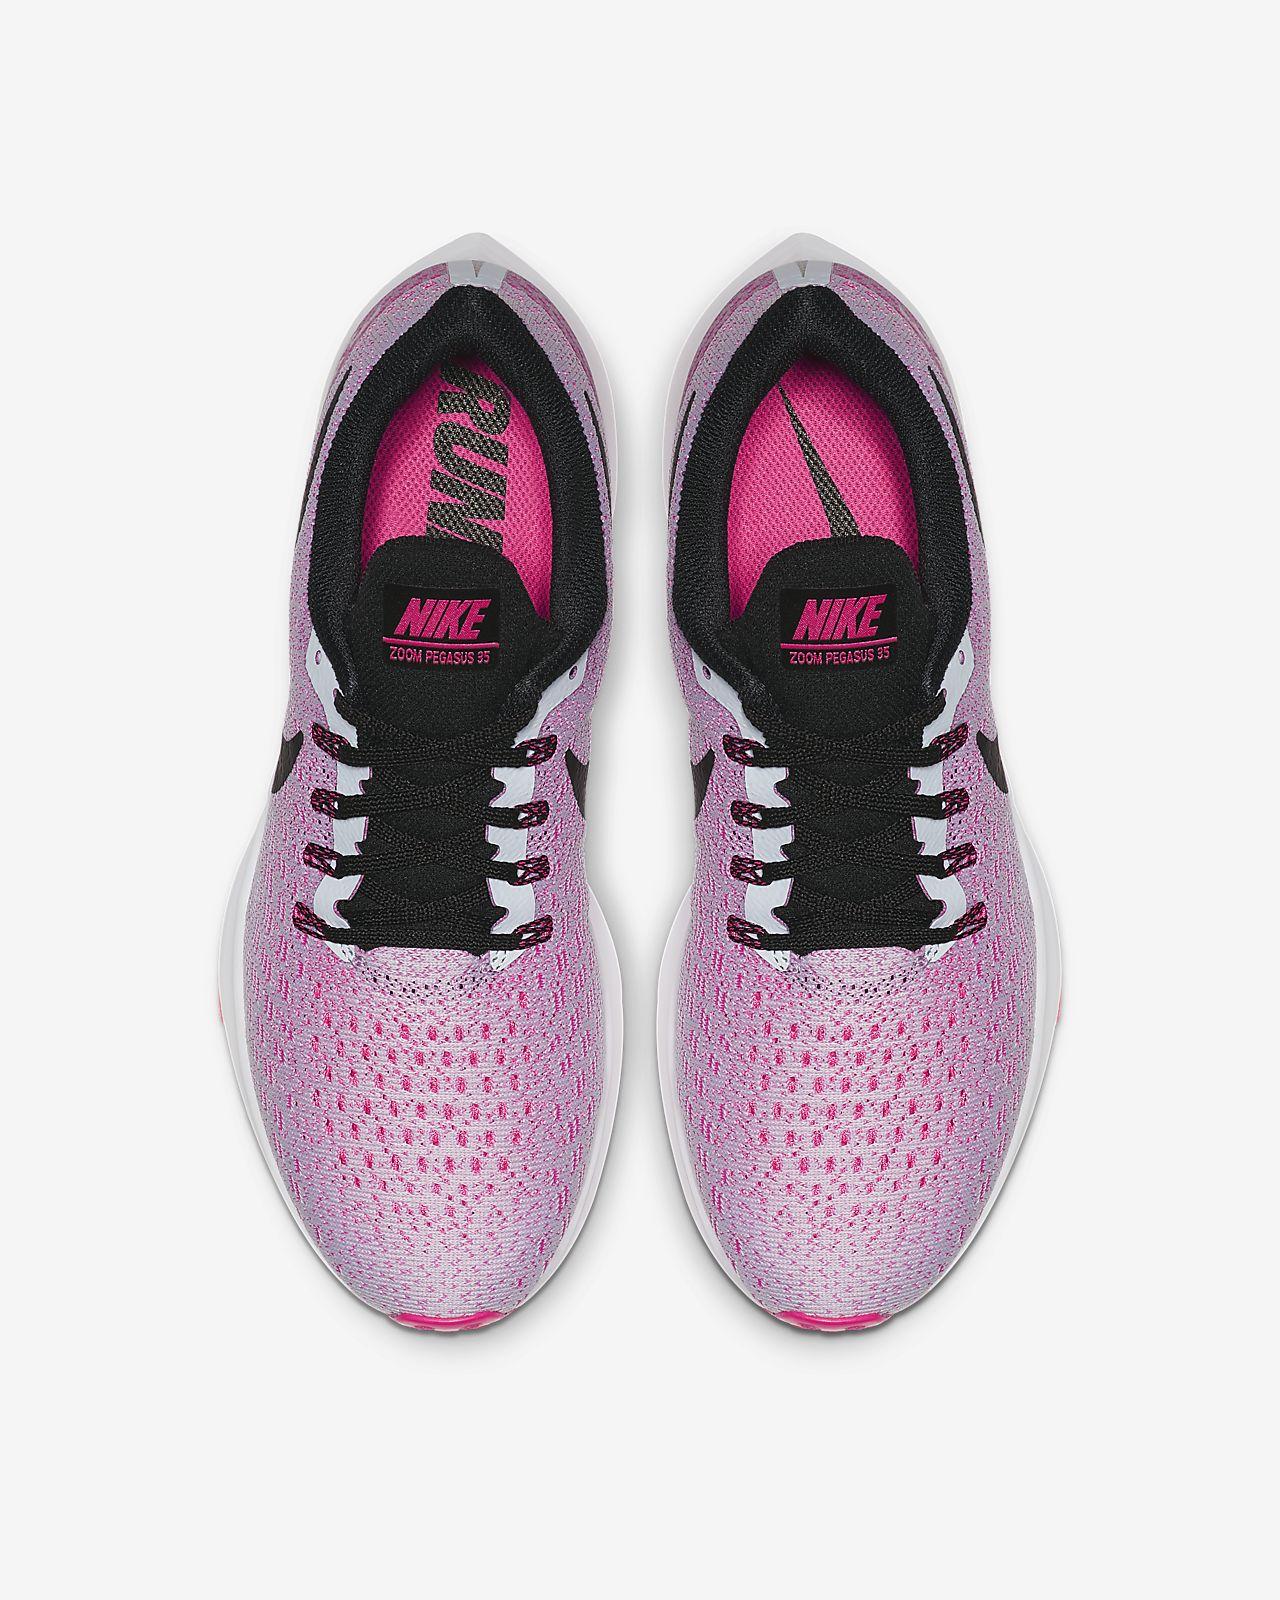 29f6f1184a11 Nike Air Zoom Pegasus 35 Women s Running Shoe. Nike.com AU